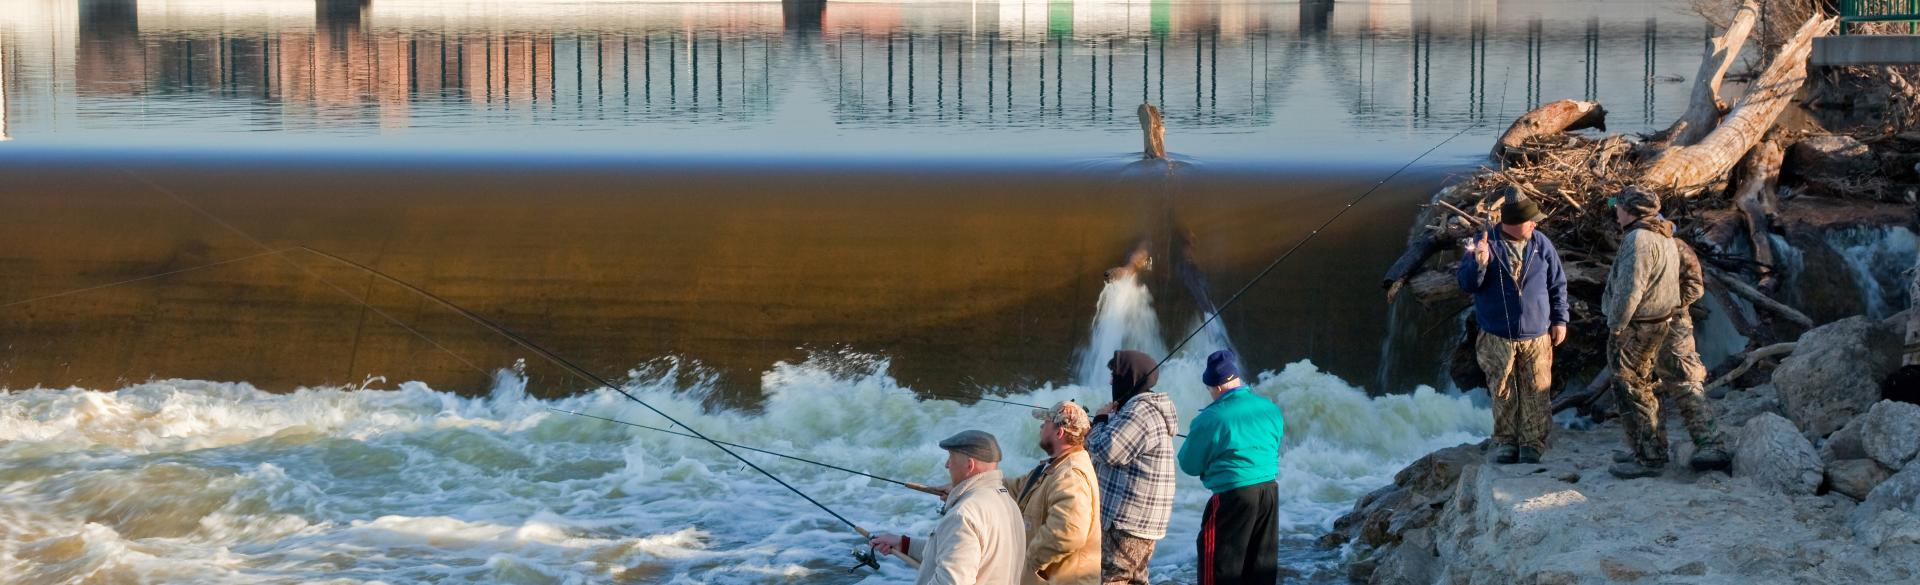 Fishing near dam and Gillett Bridge